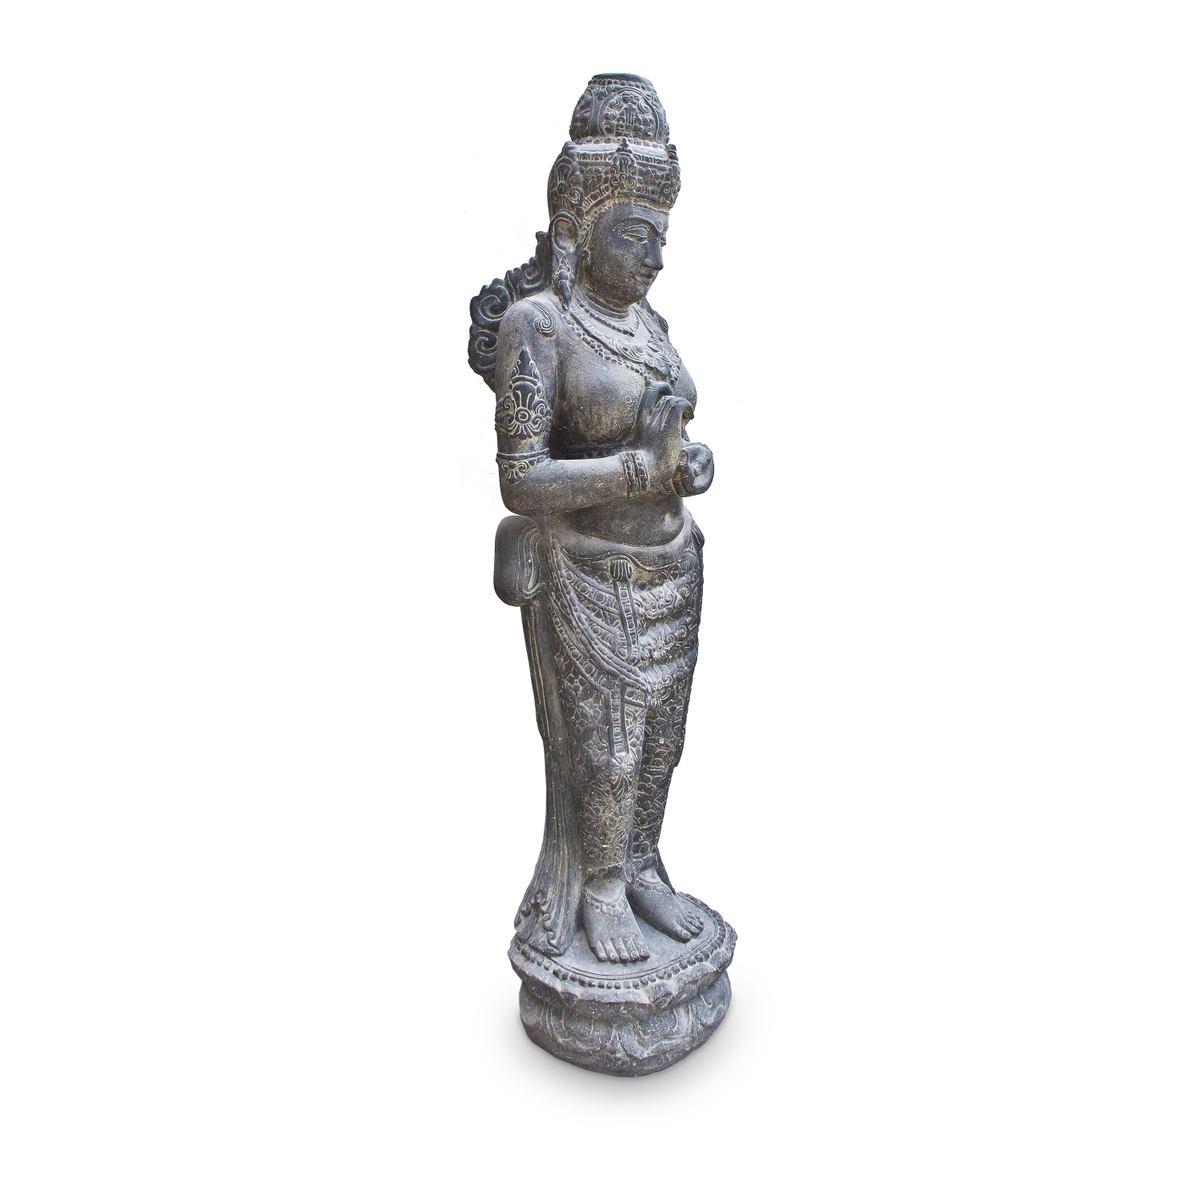 Devi Göttin Hinduismus Figur Skulptur Stein Lavasand Bali Gott